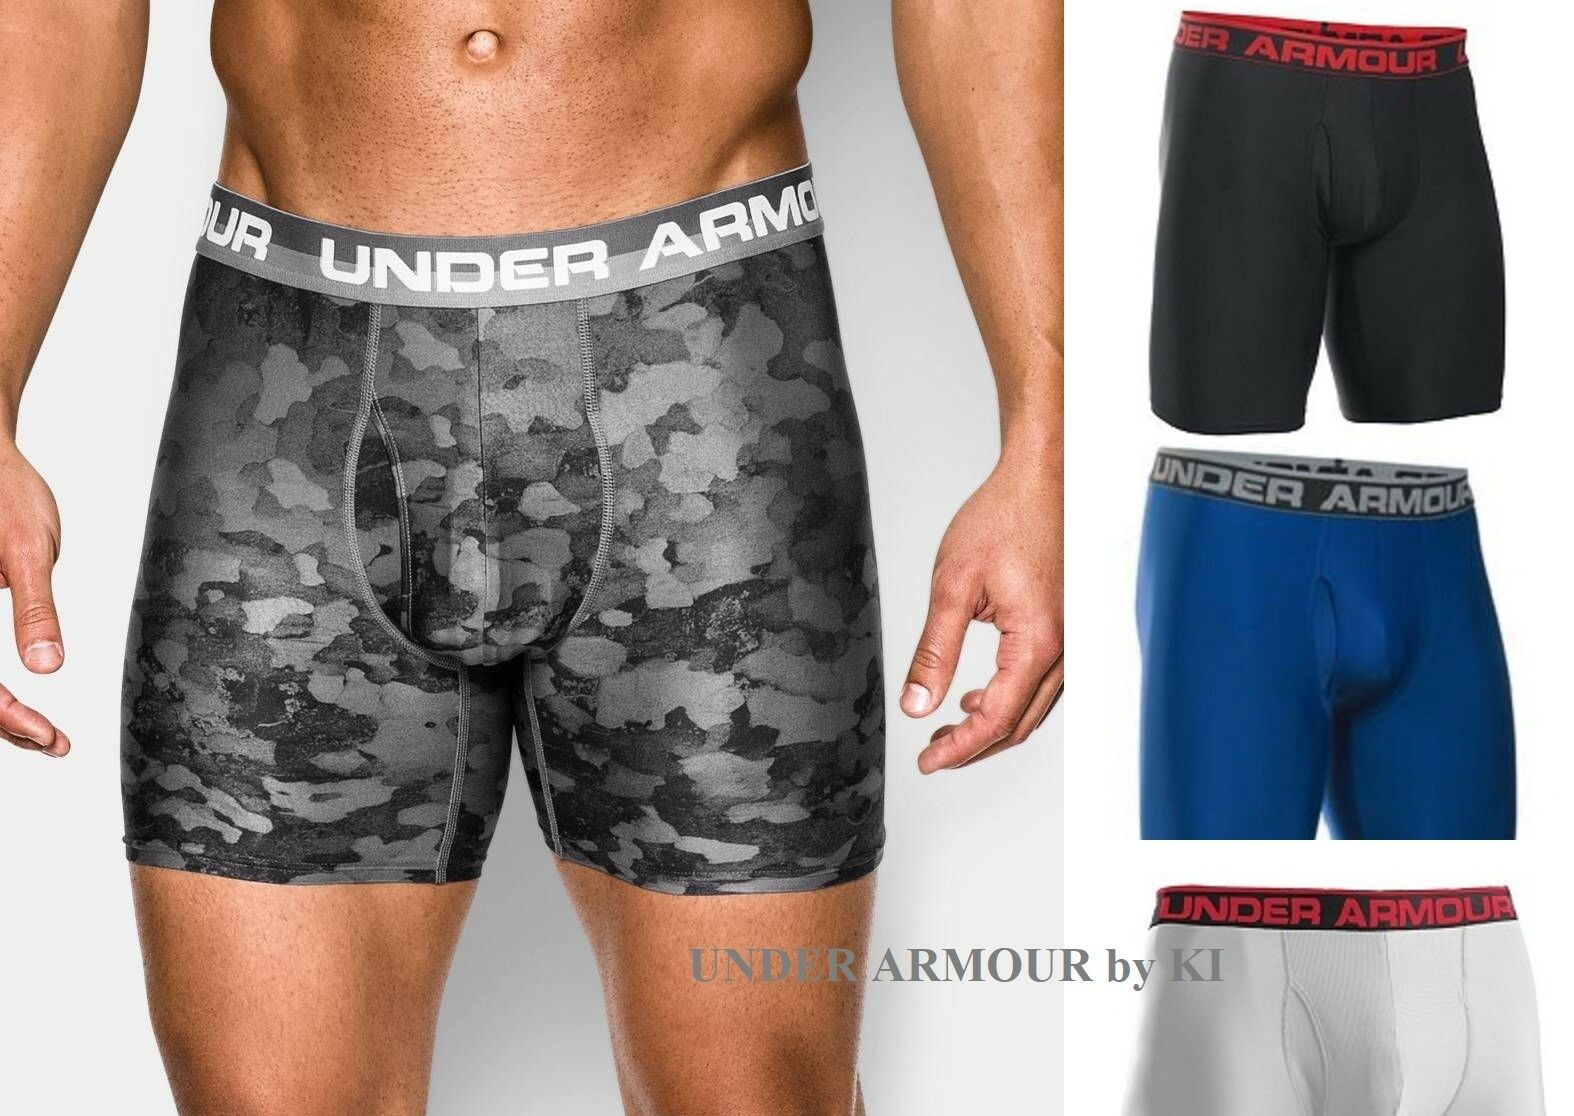 Under Armour HeatGear Men's Boxer Briefs UA Original Series